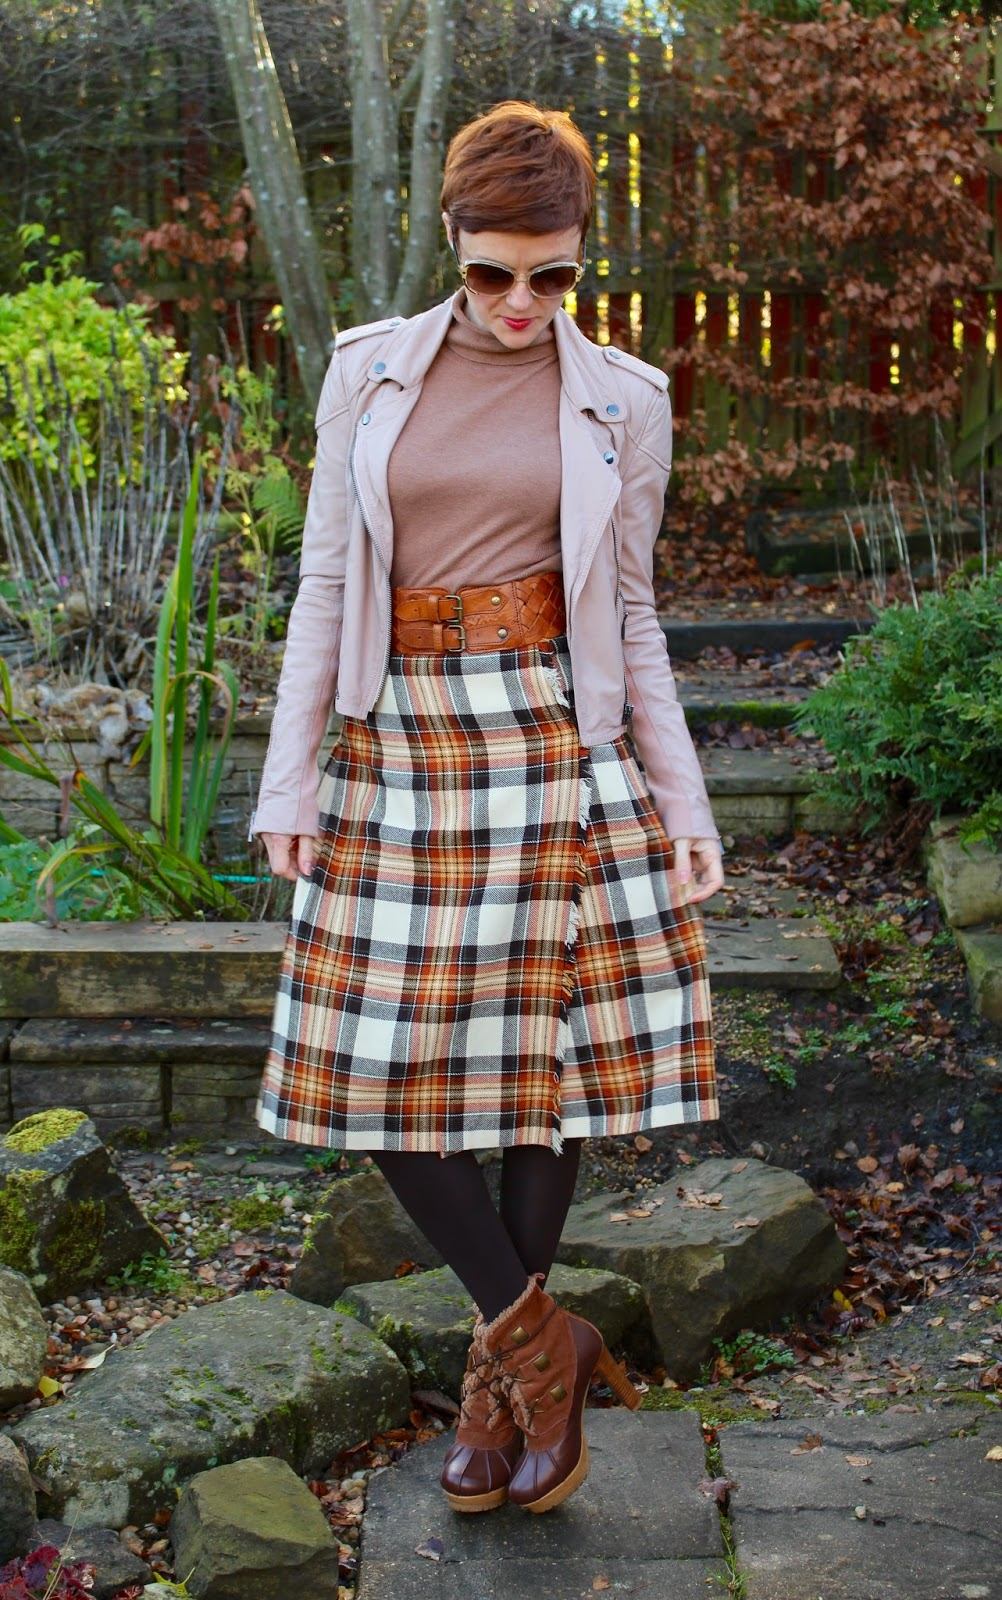 Styling a vintage skirt, midi-kilt | Fake Fabulous